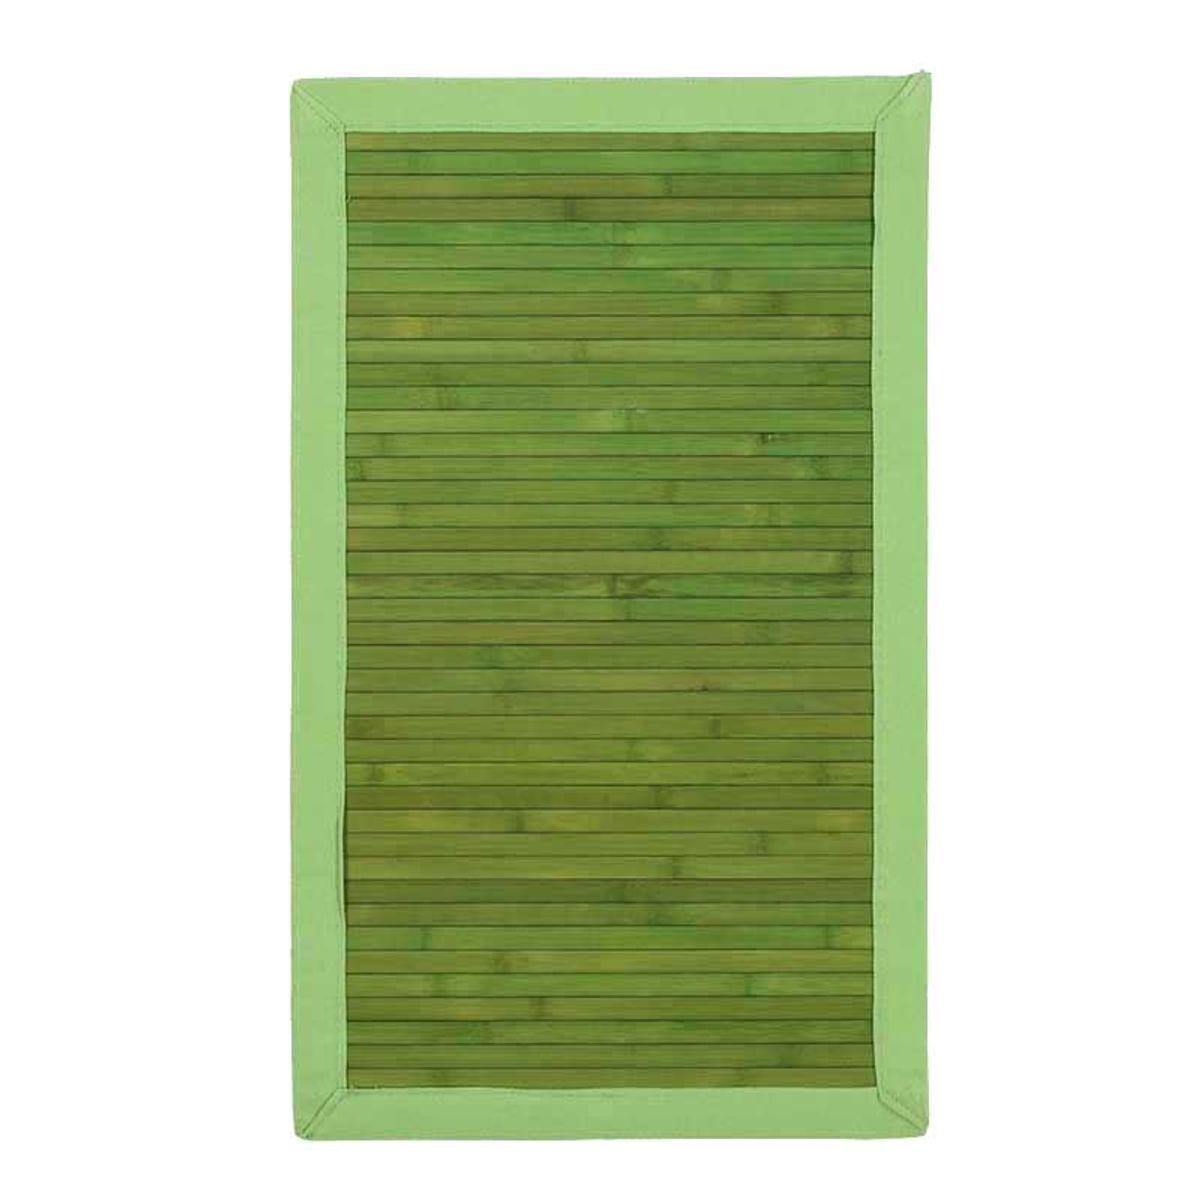 TheDecoFactory SOLO BAMBOO - Tapis en bambou larges lattes et ganse vert 45x75 Vert